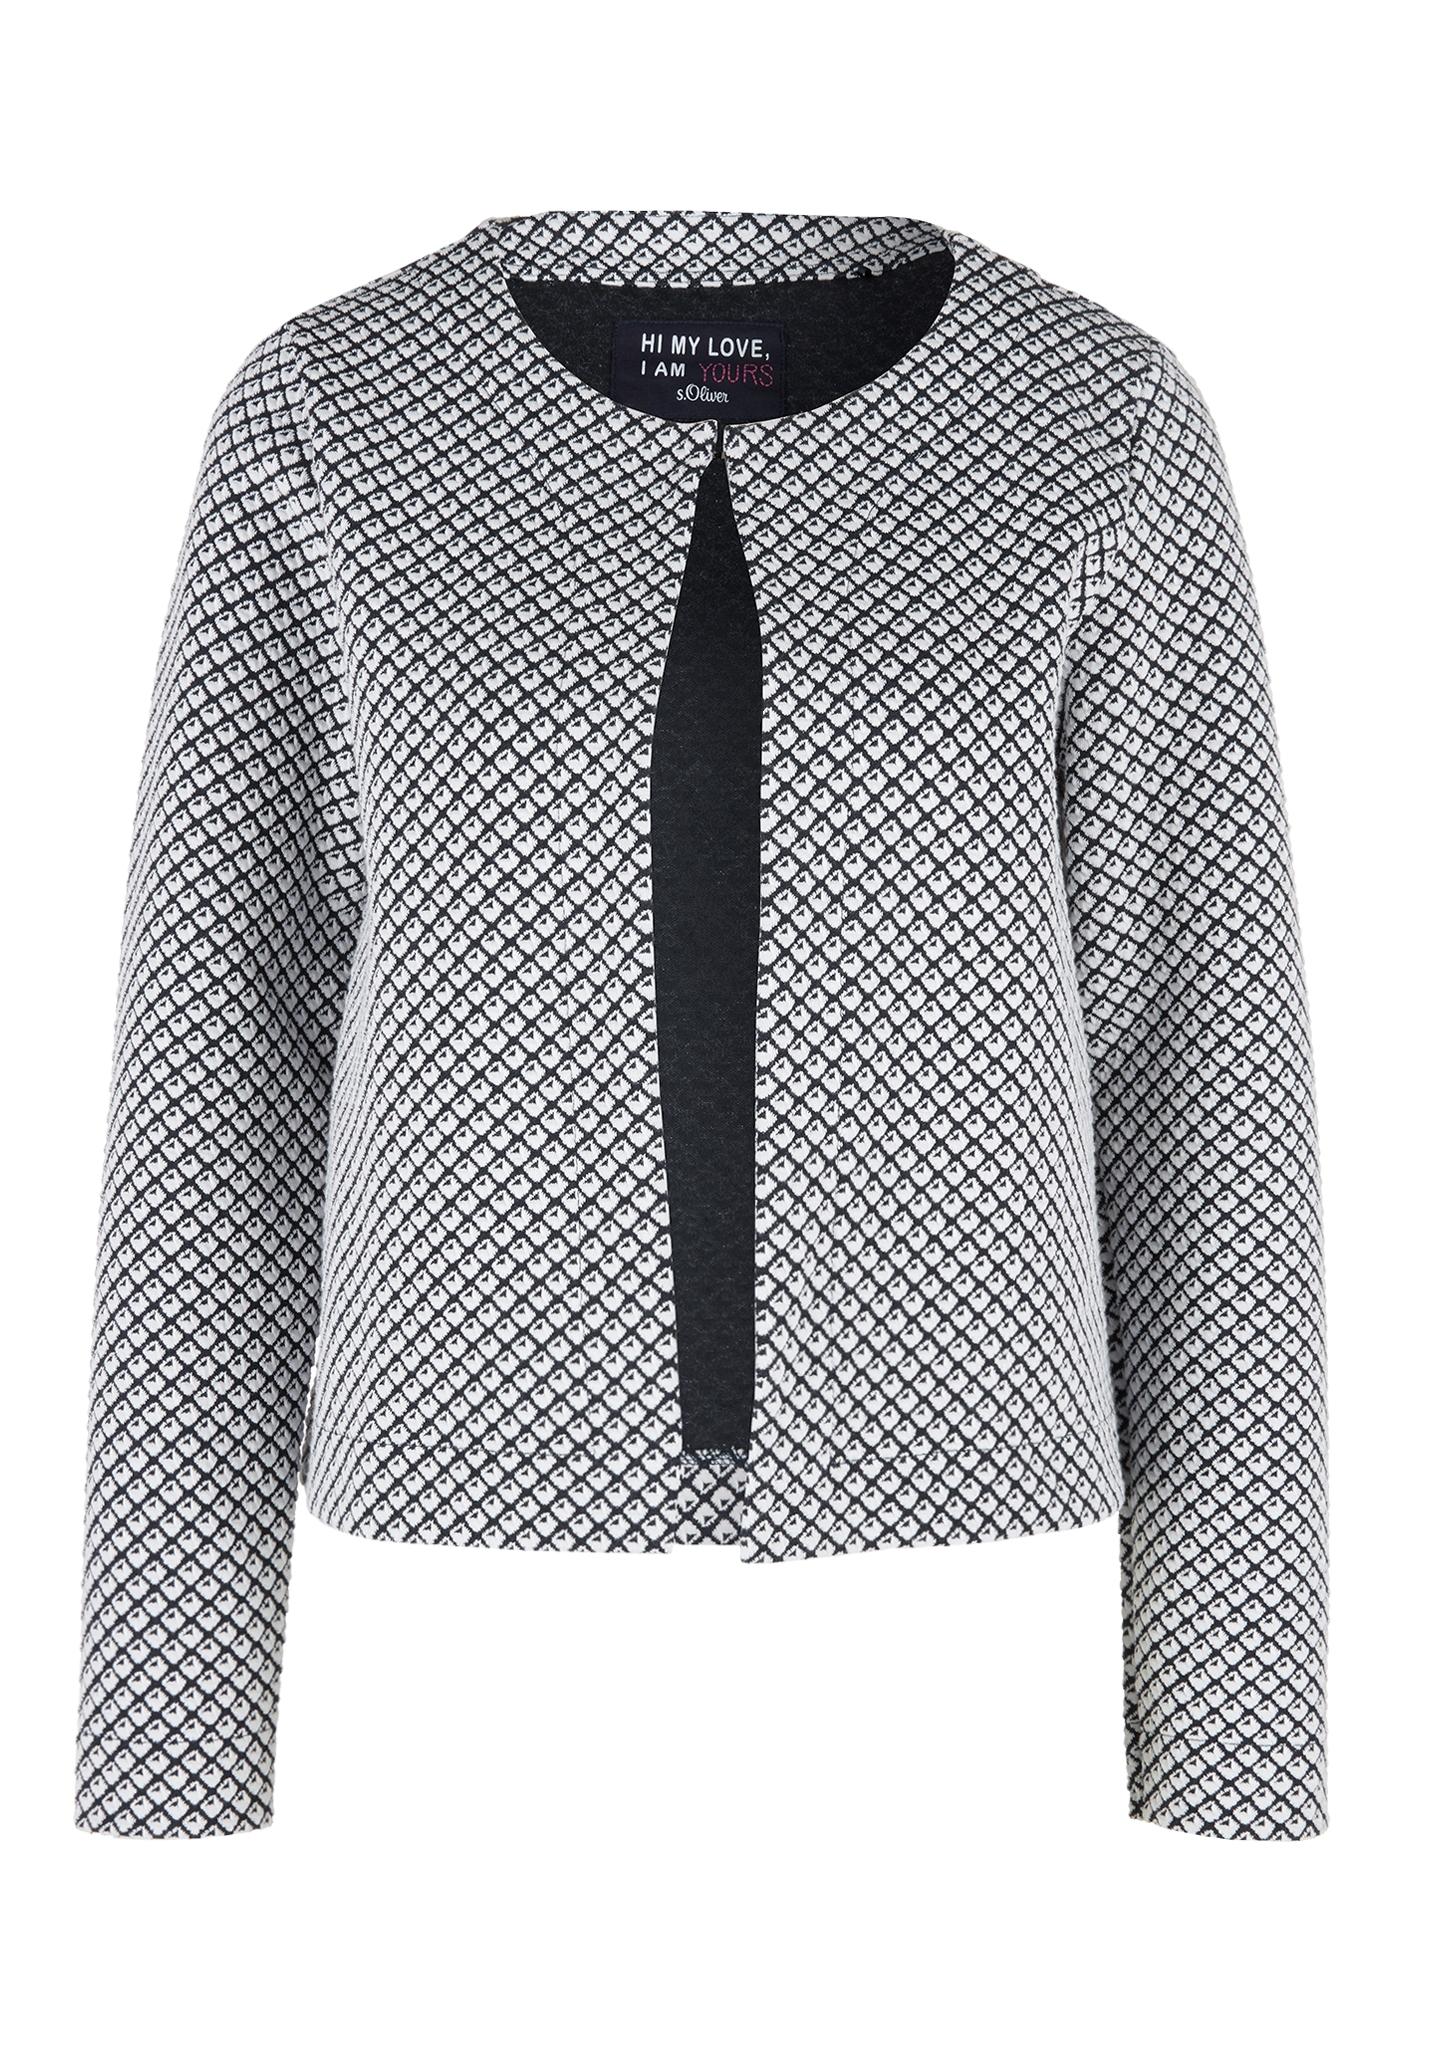 Sweatjacke | Bekleidung > Sweatshirts & -jacken > Sweatjacken | s.Oliver